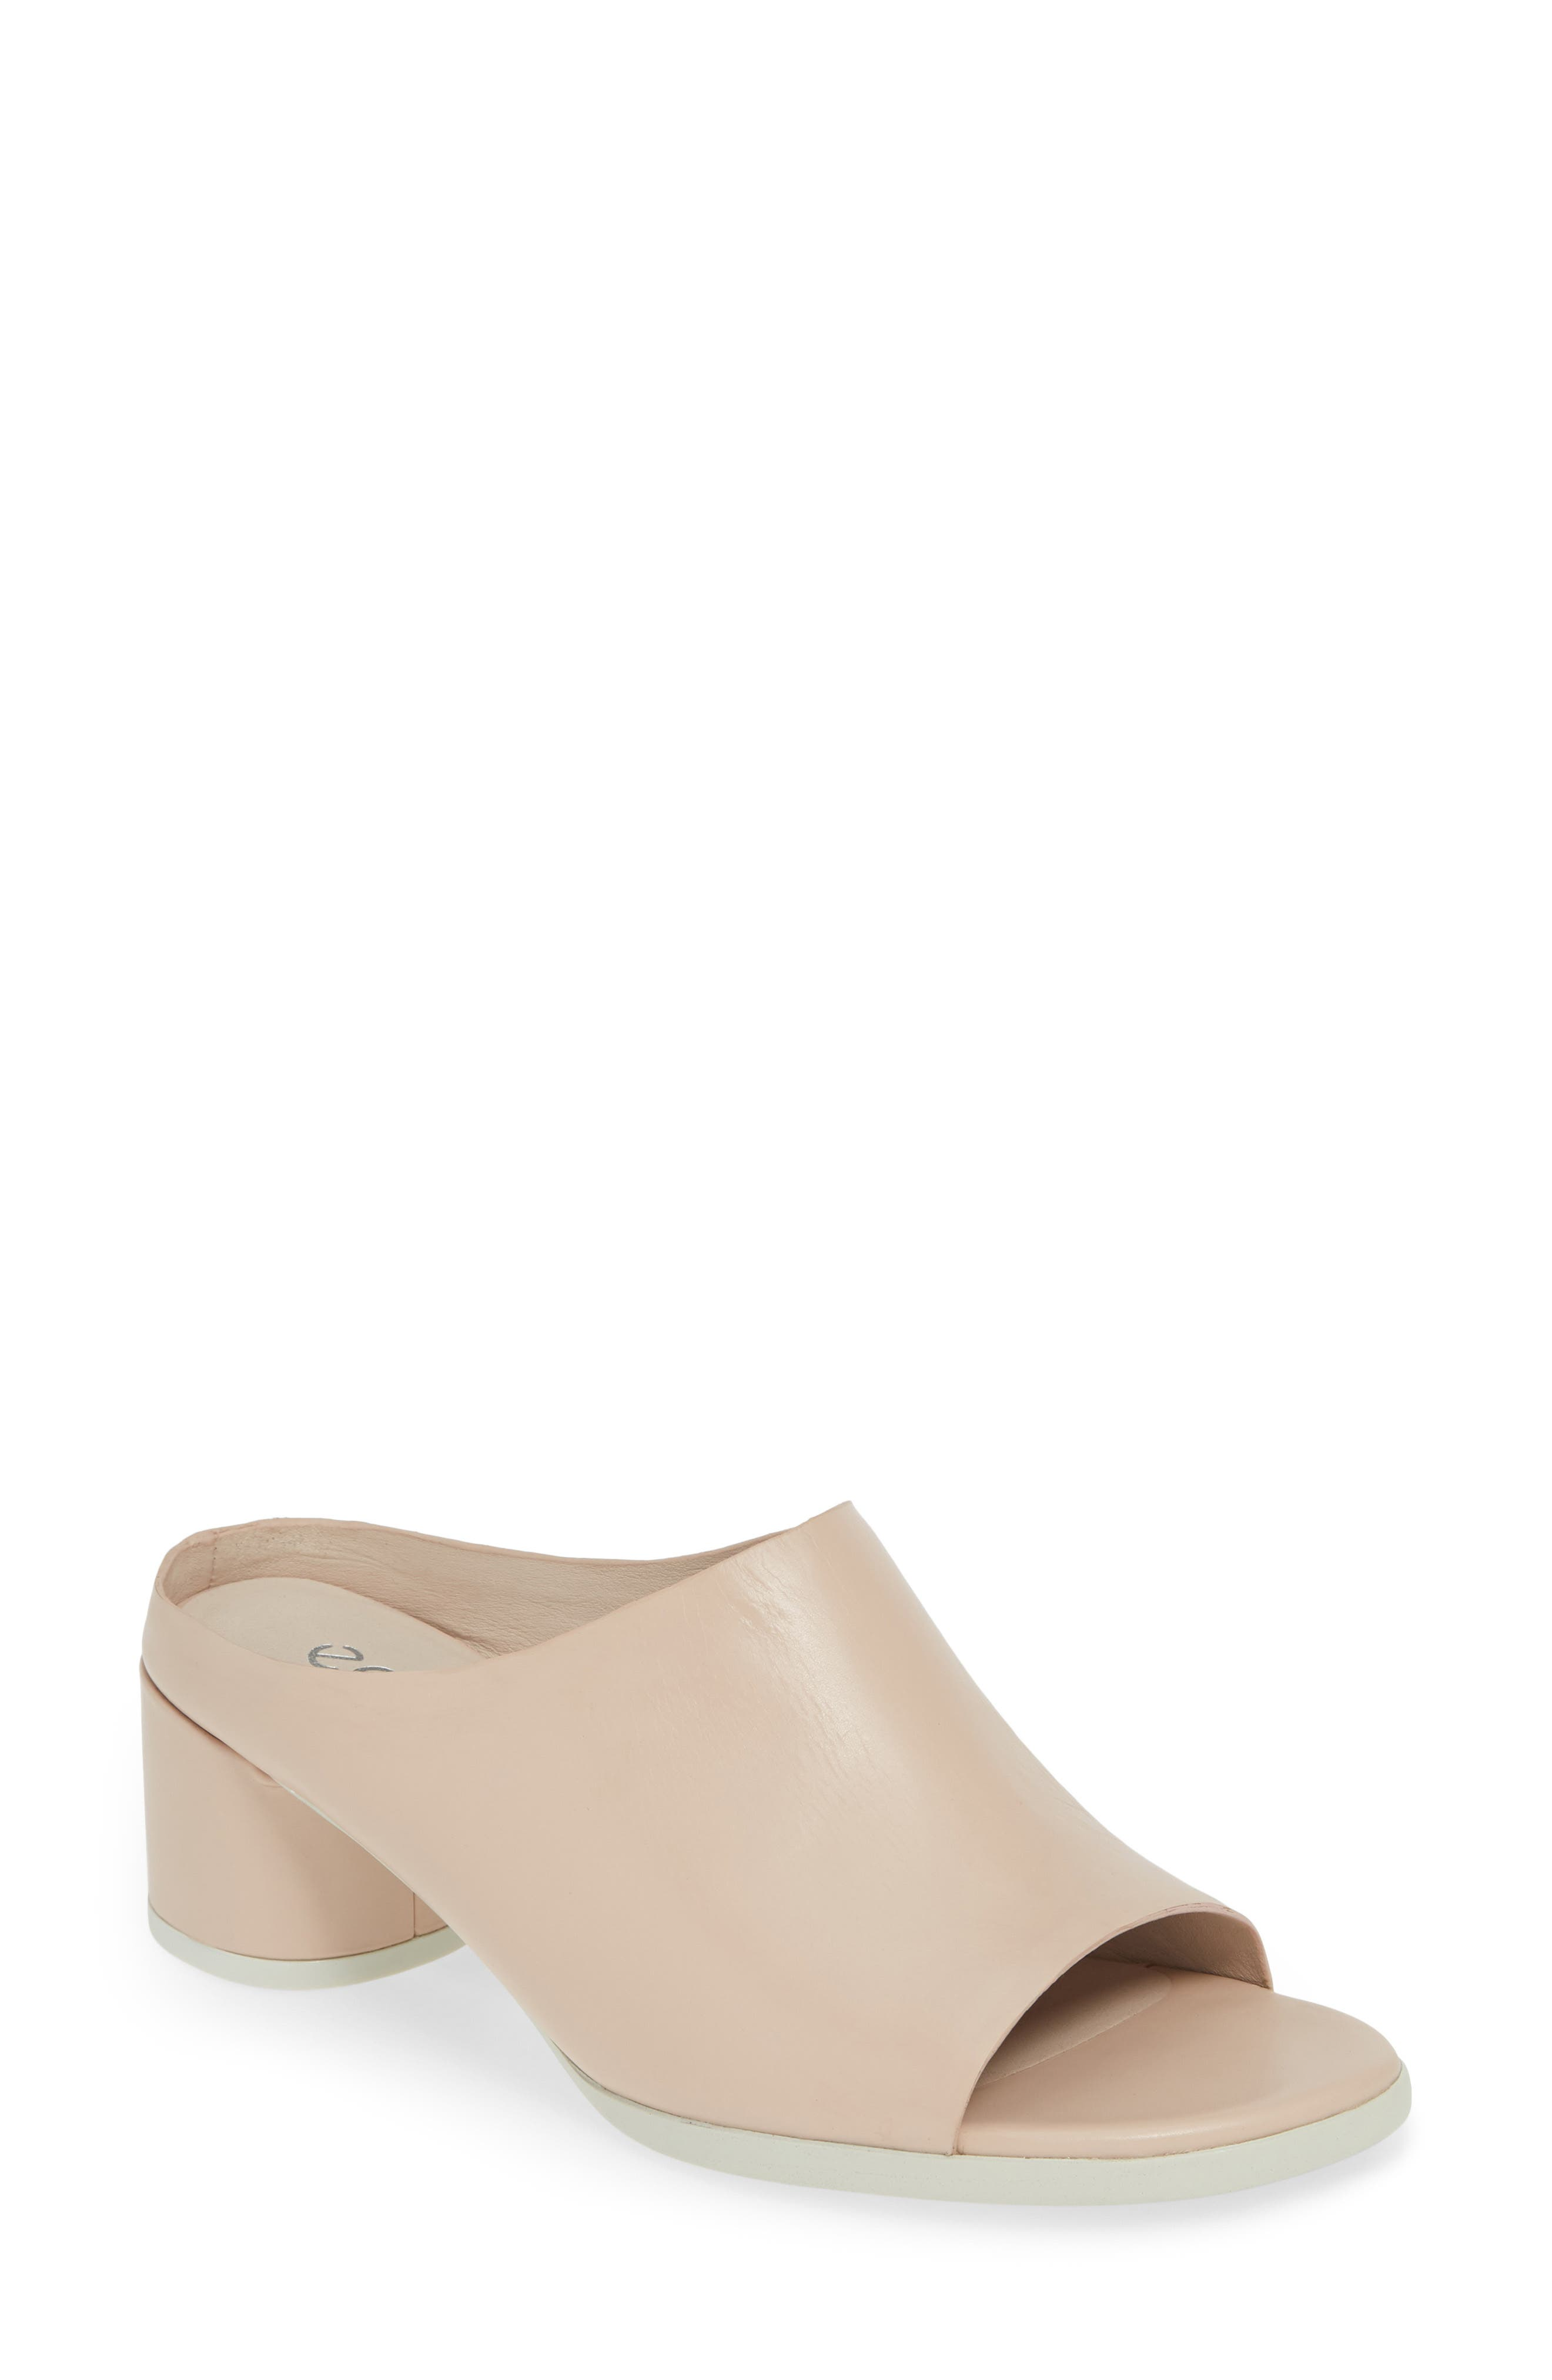 UPC 825840000535 product image for Women's Ecco Shape 45 Block Heel Slide Sandal, Size 5-5.5US / 36EU - Pink | upcitemdb.com